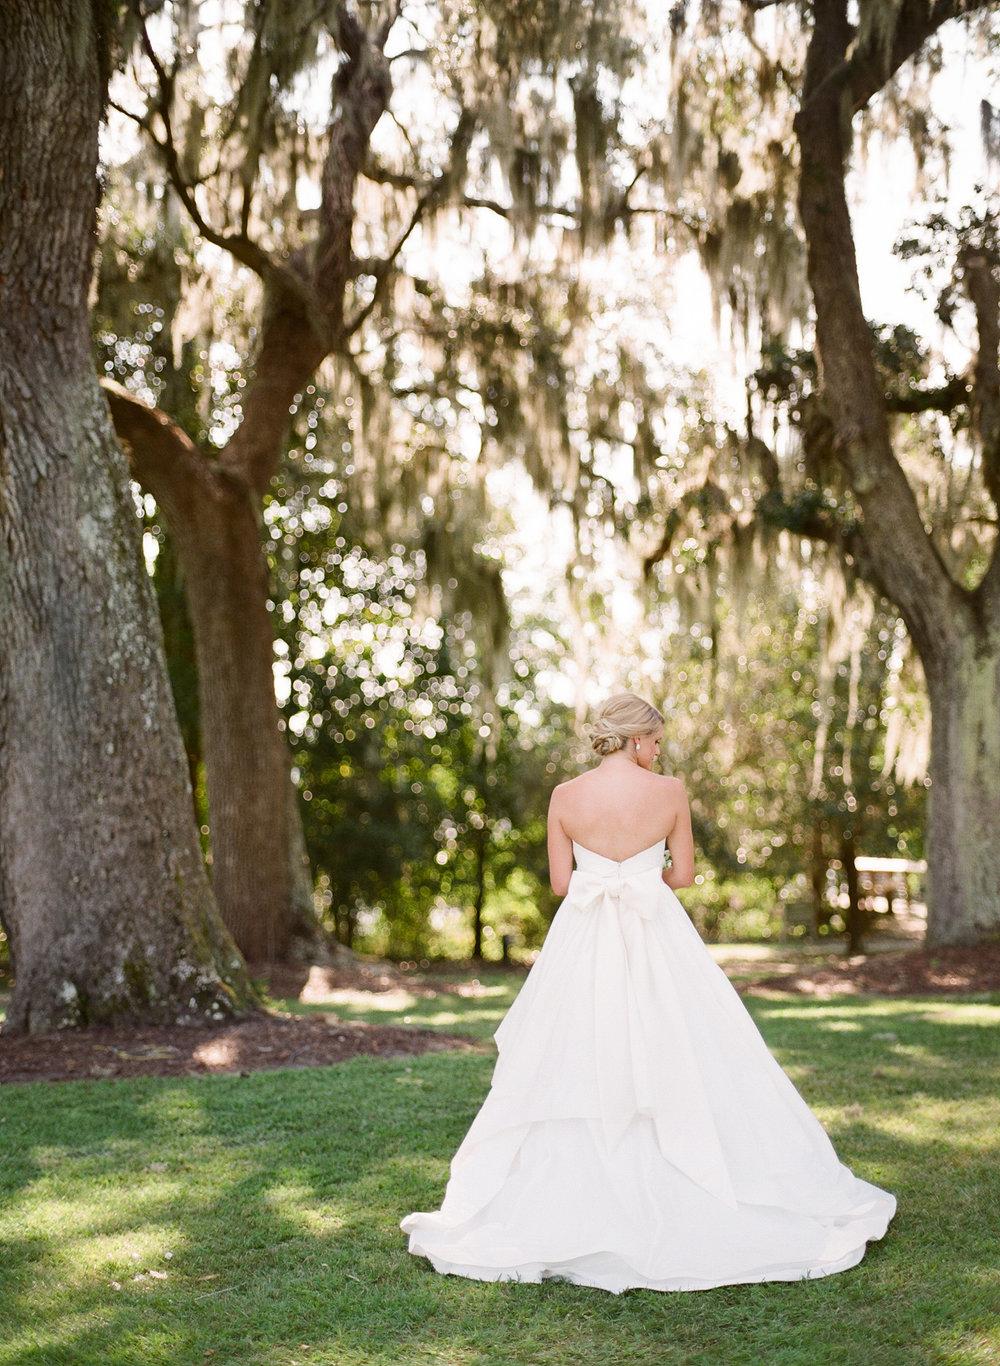 Airlie-Gardens-Wedding-20.jpg